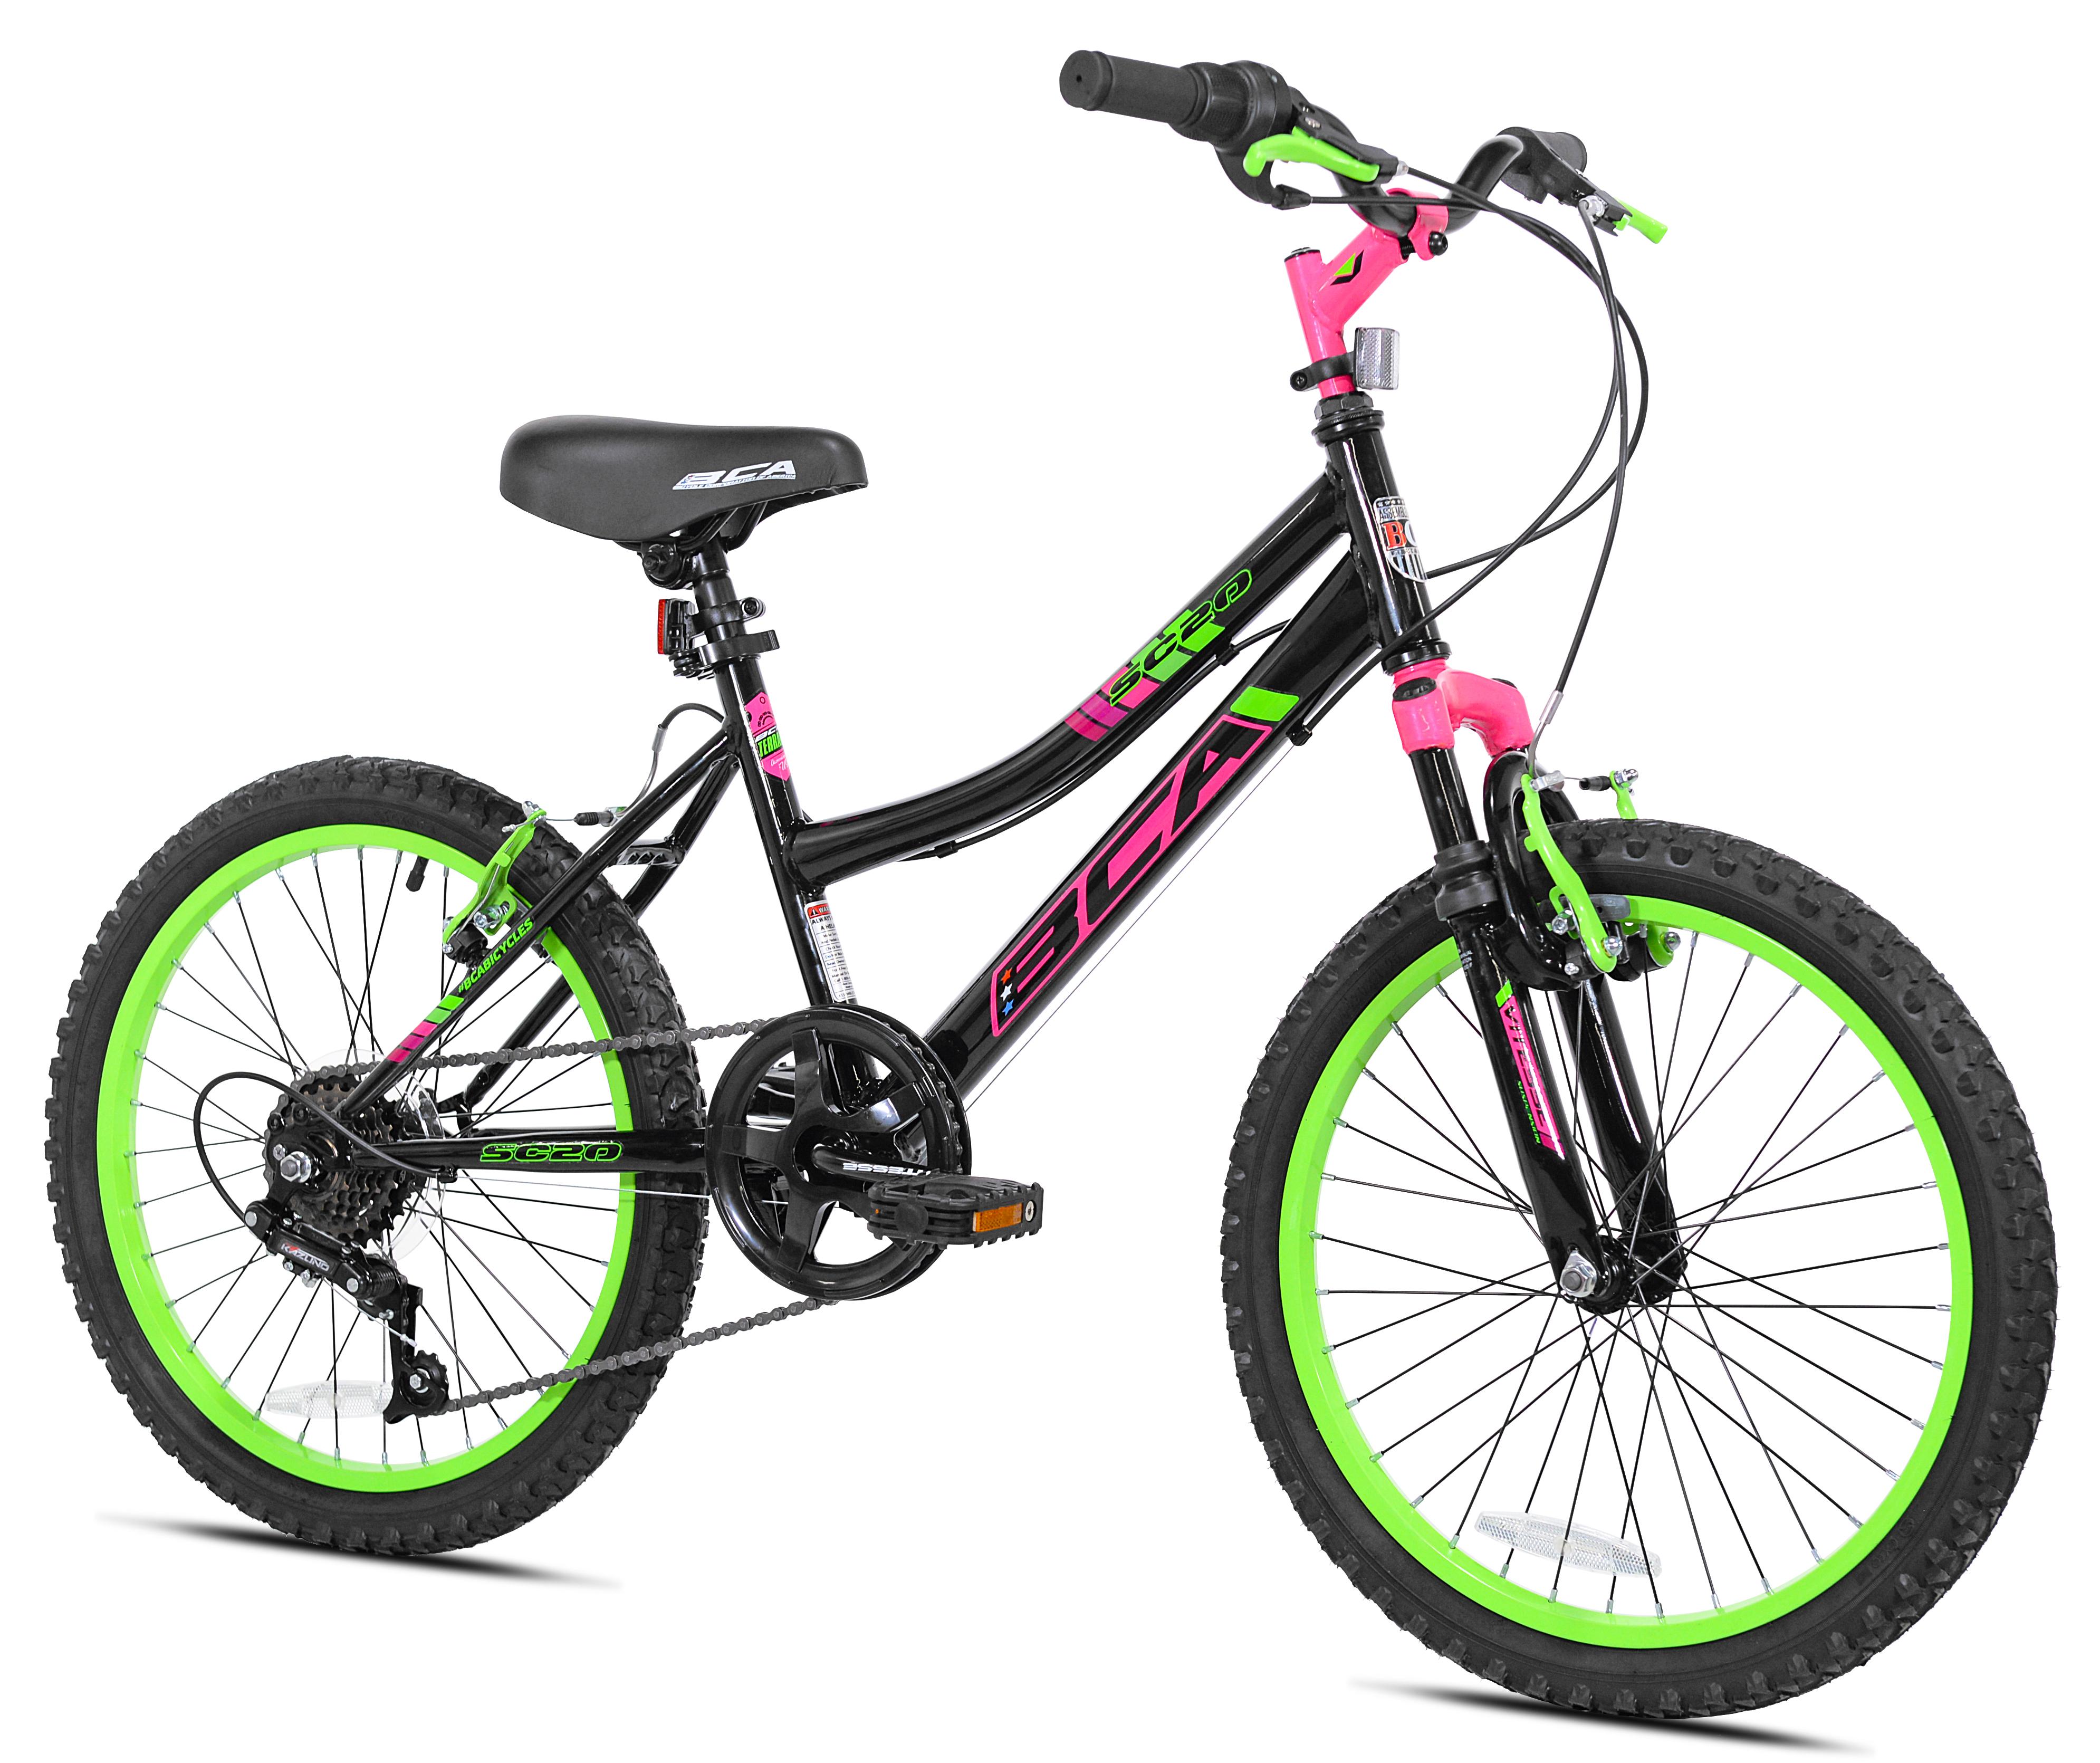 "BCA 20"" Girls', SC20 Bicycle, Black/Green $45 (55% off) in Walmart store (YMMV)"